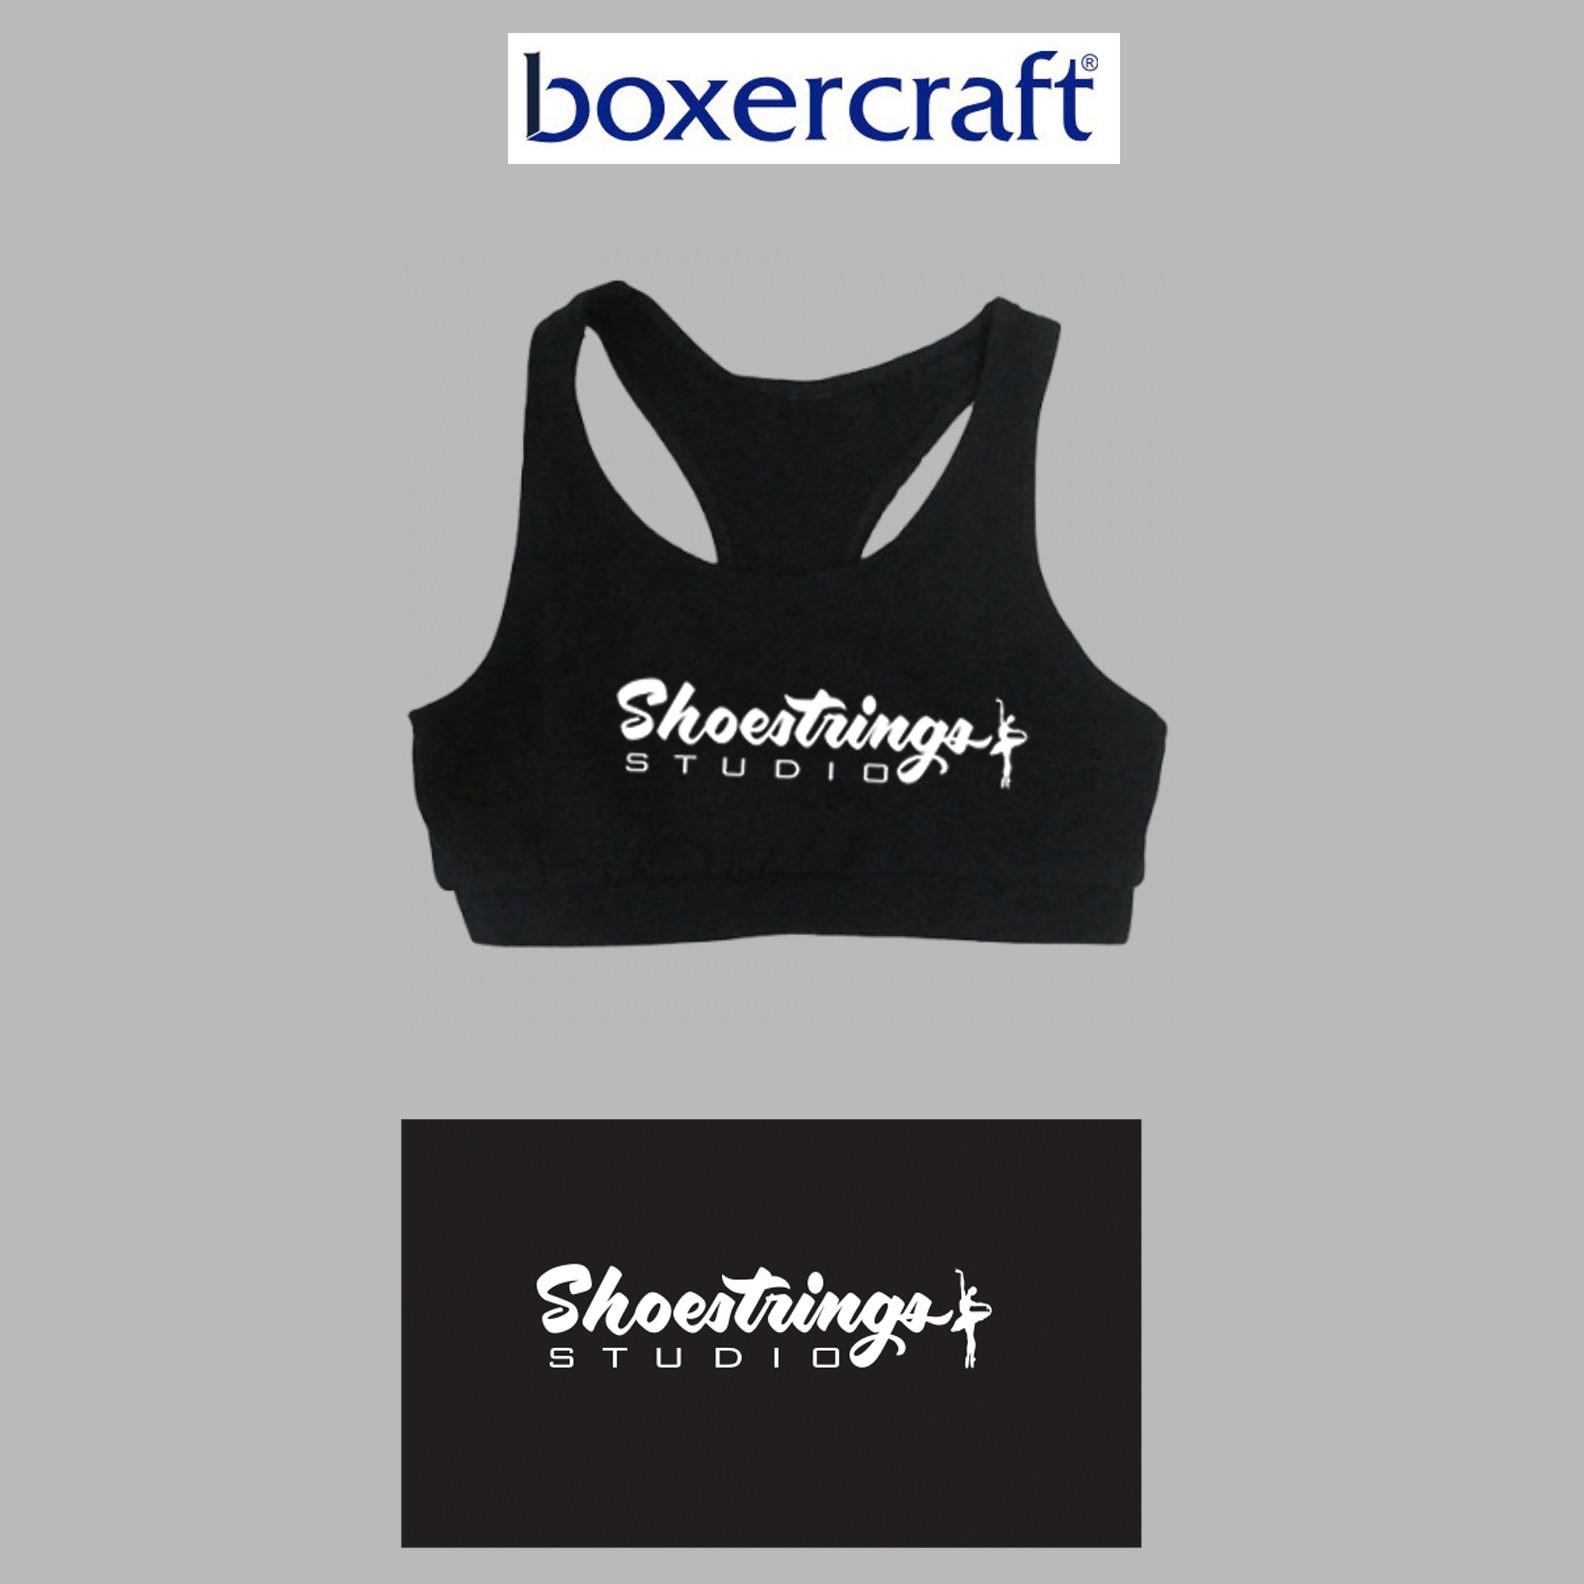 Shoestrings Studio Boxercraft Black Sports Bra, Youth